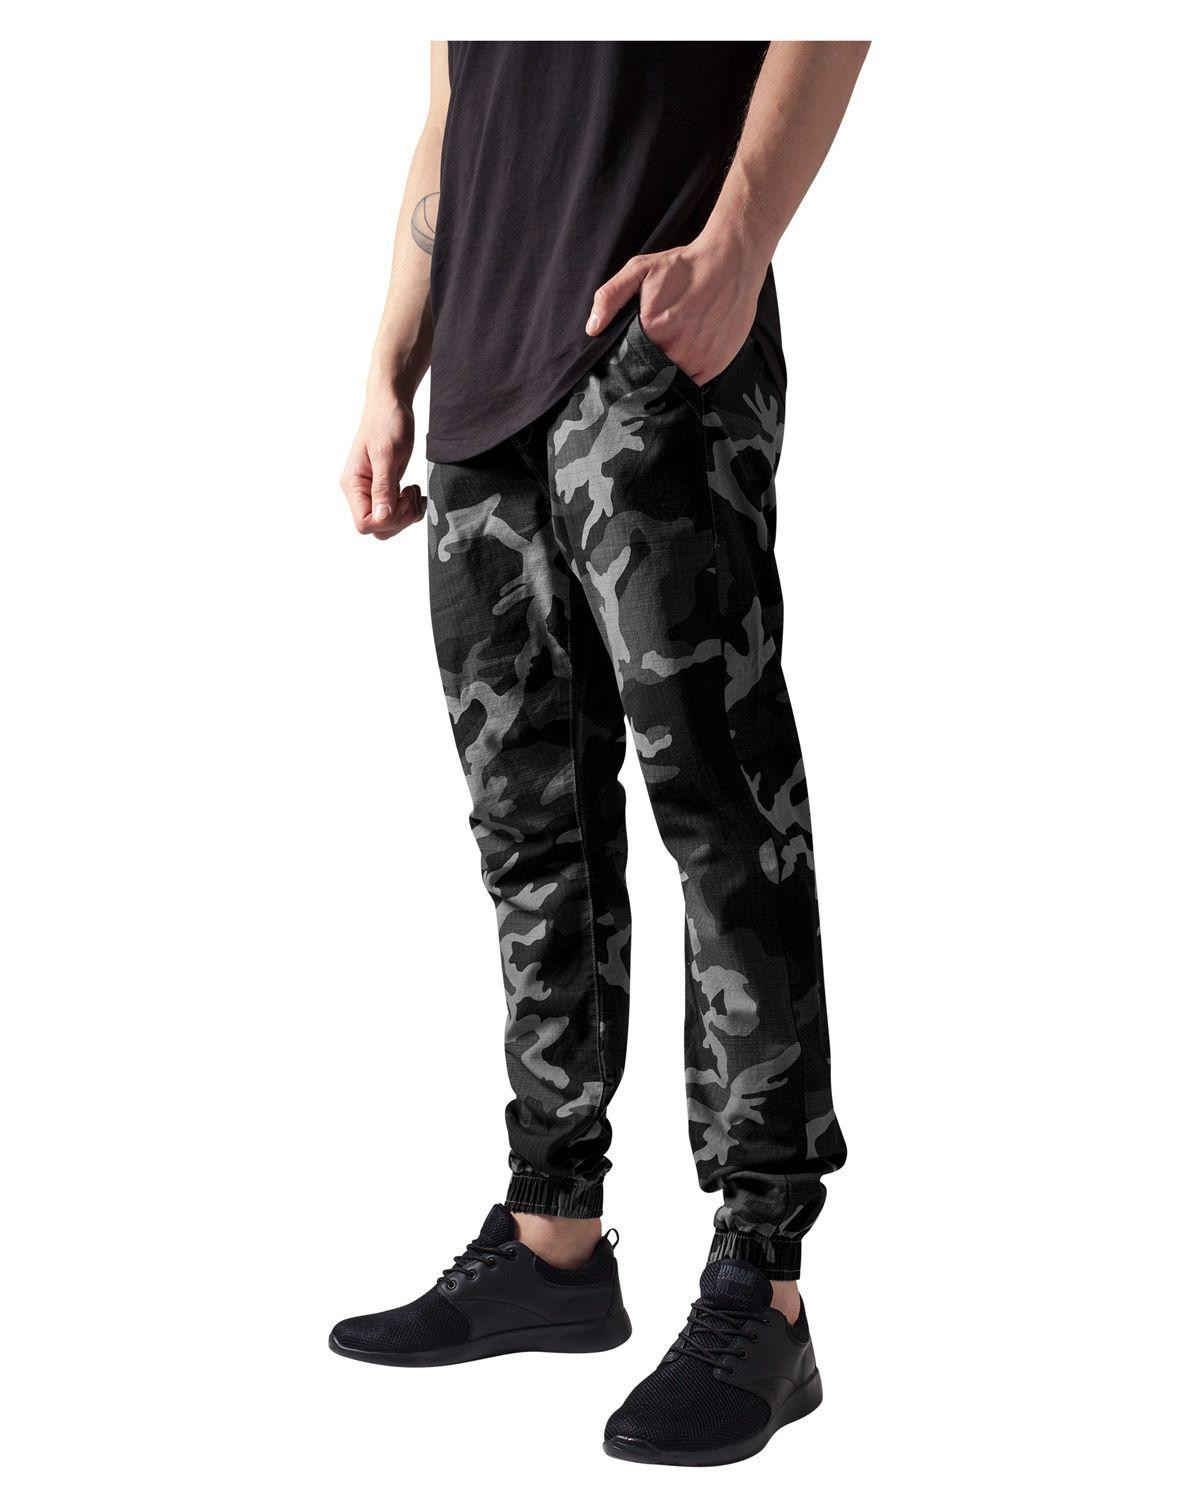 Image of   Urban Classics Camo Ripstop Jogging Bukser (Dark Camo, XL)